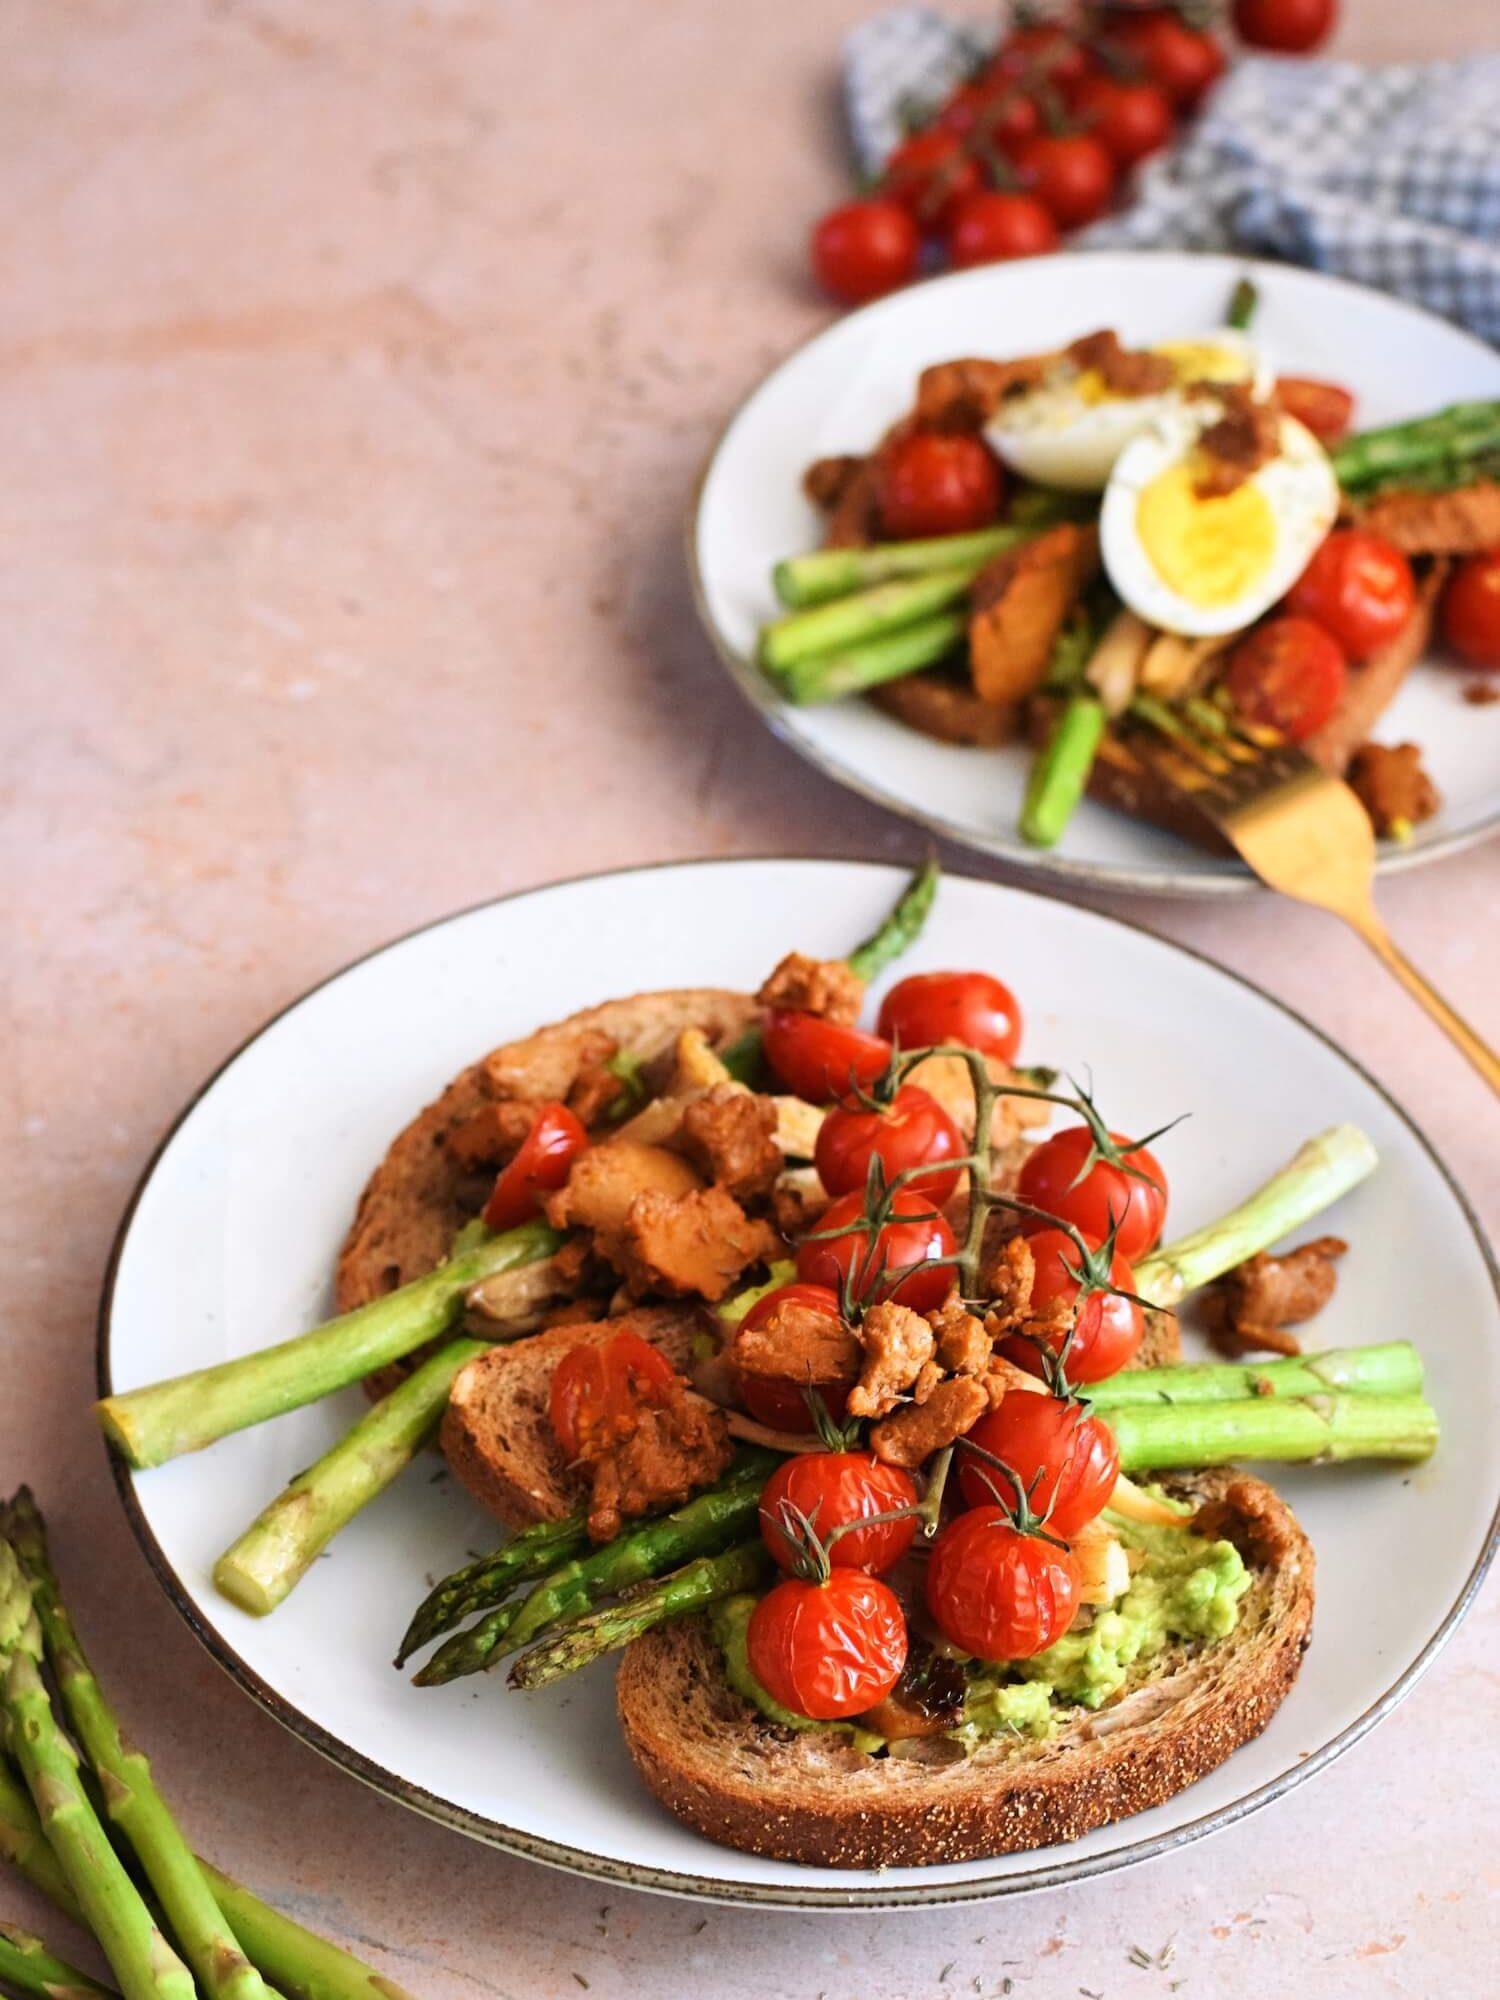 Smashed avocado toast met geroosterde tomaatjes en asperges | Vegan recept